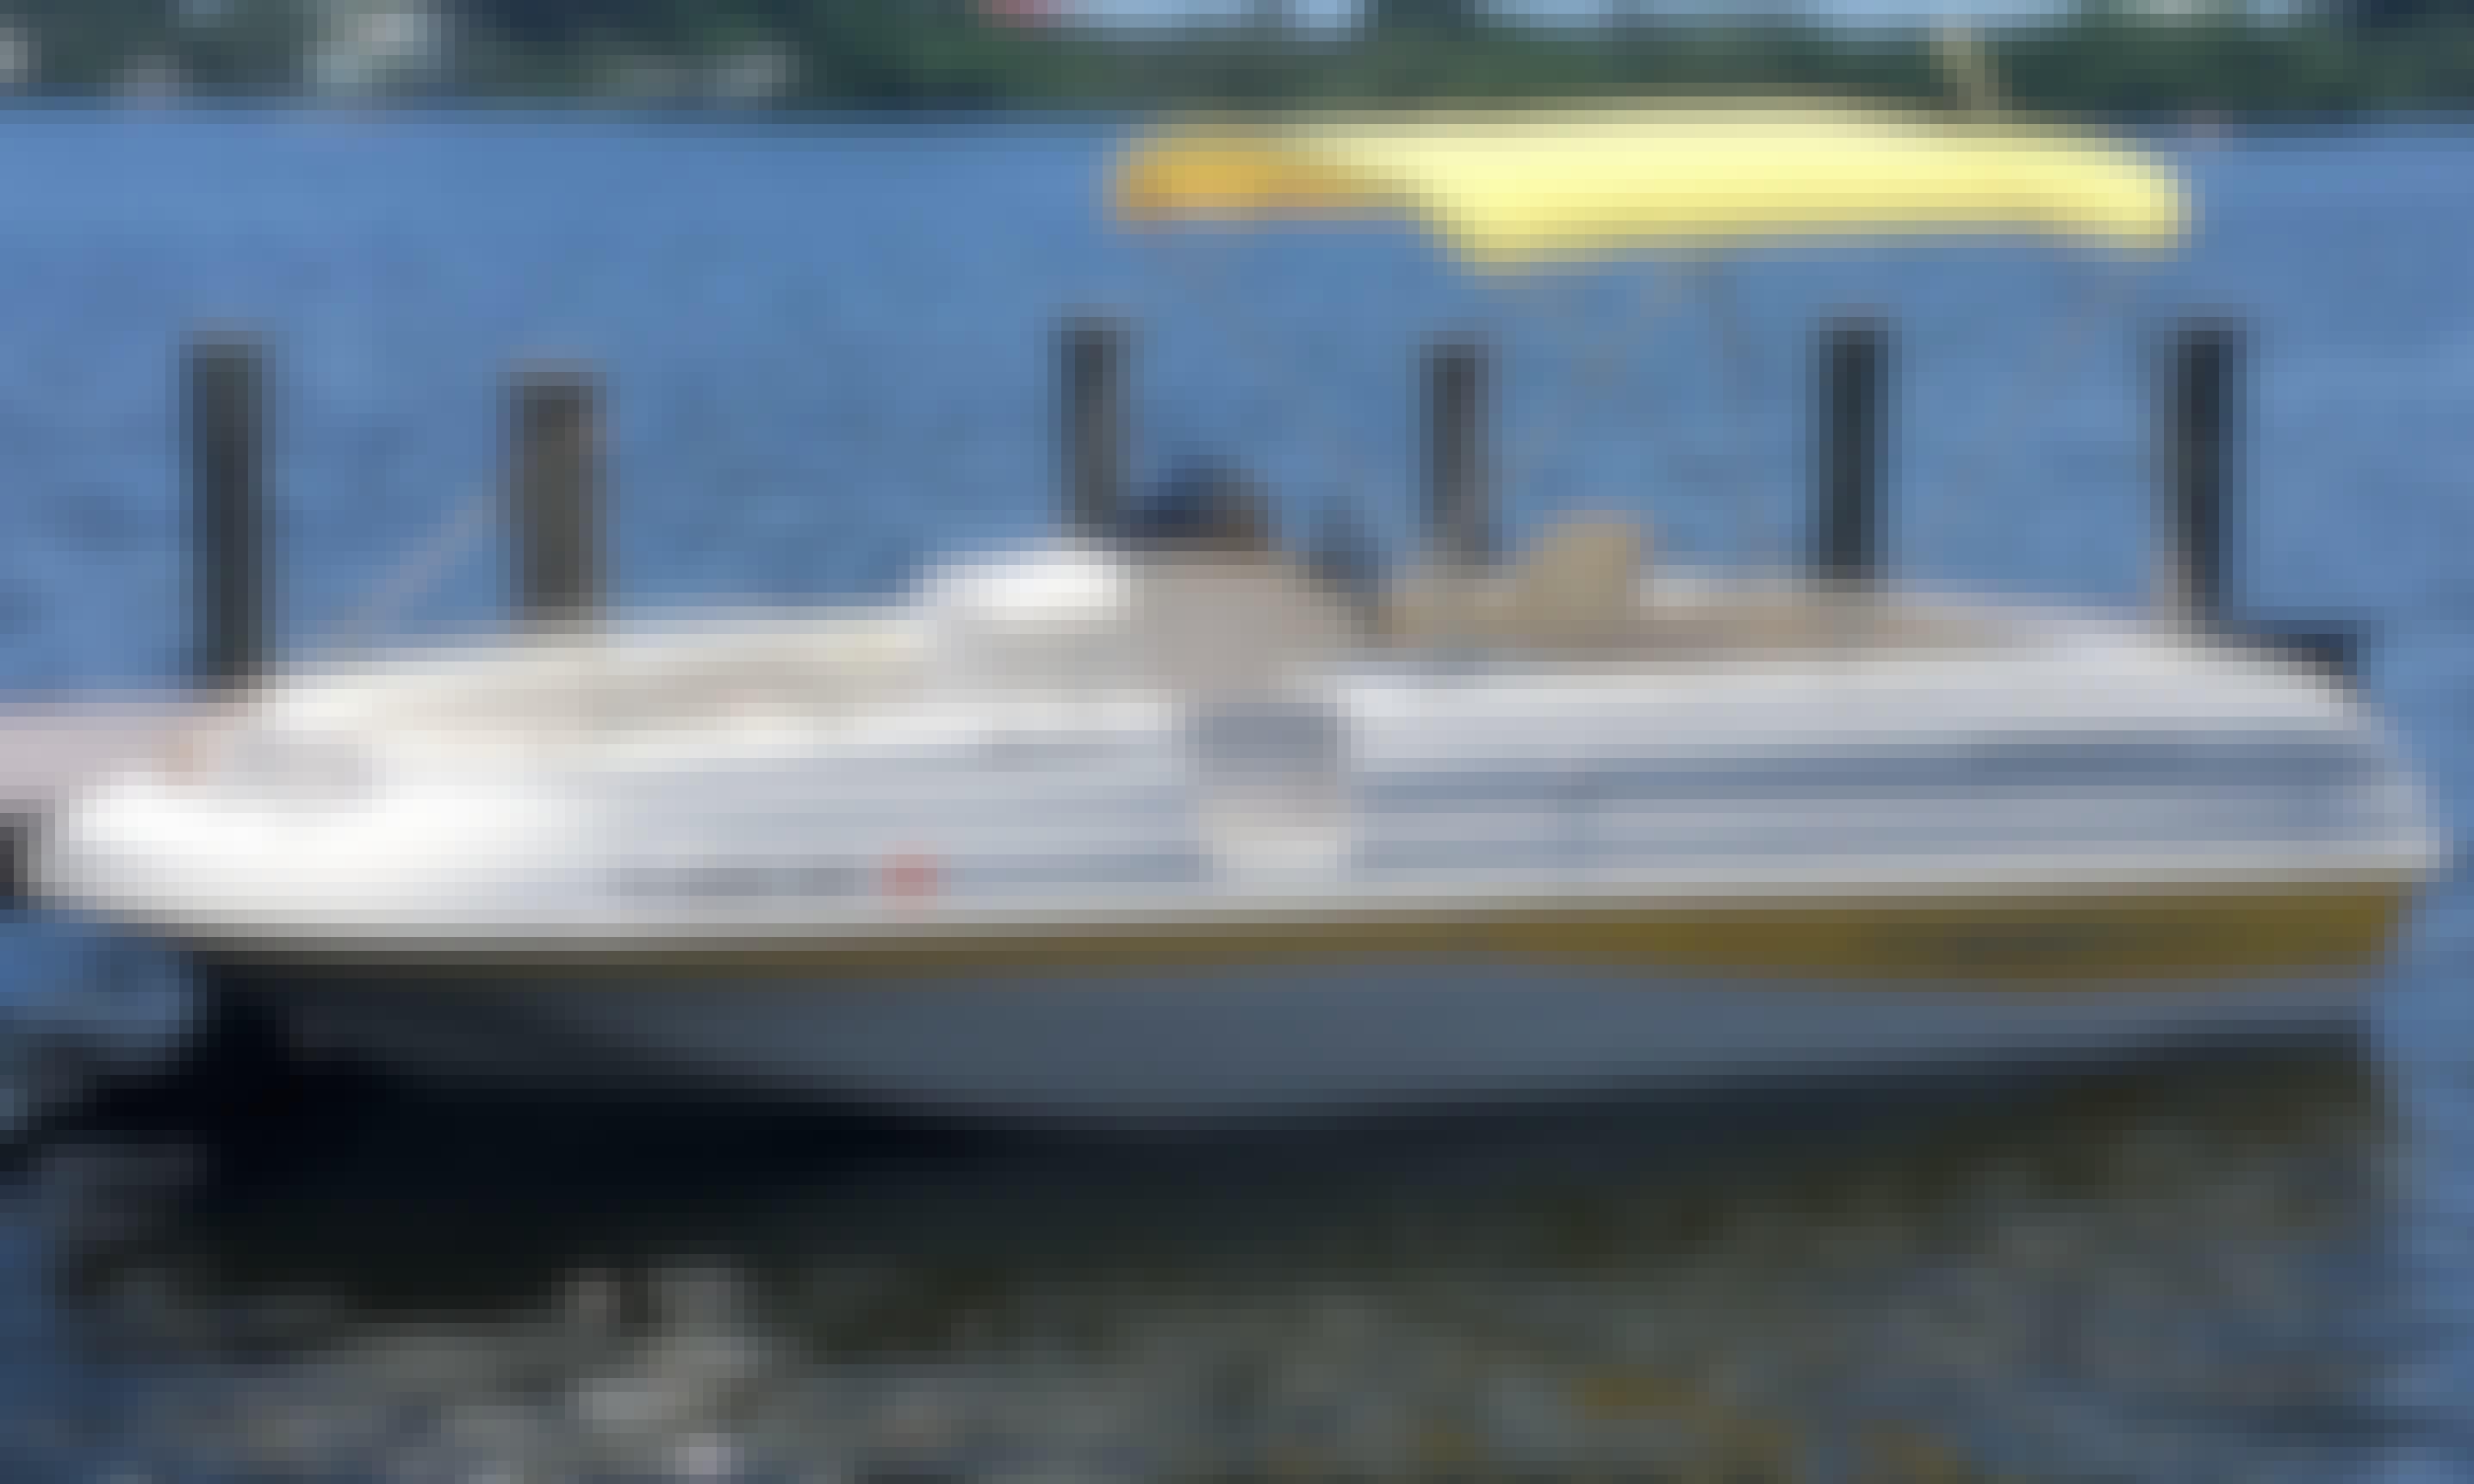 Stardeck 205 Deck Boat Rental in Sarasota, Florida